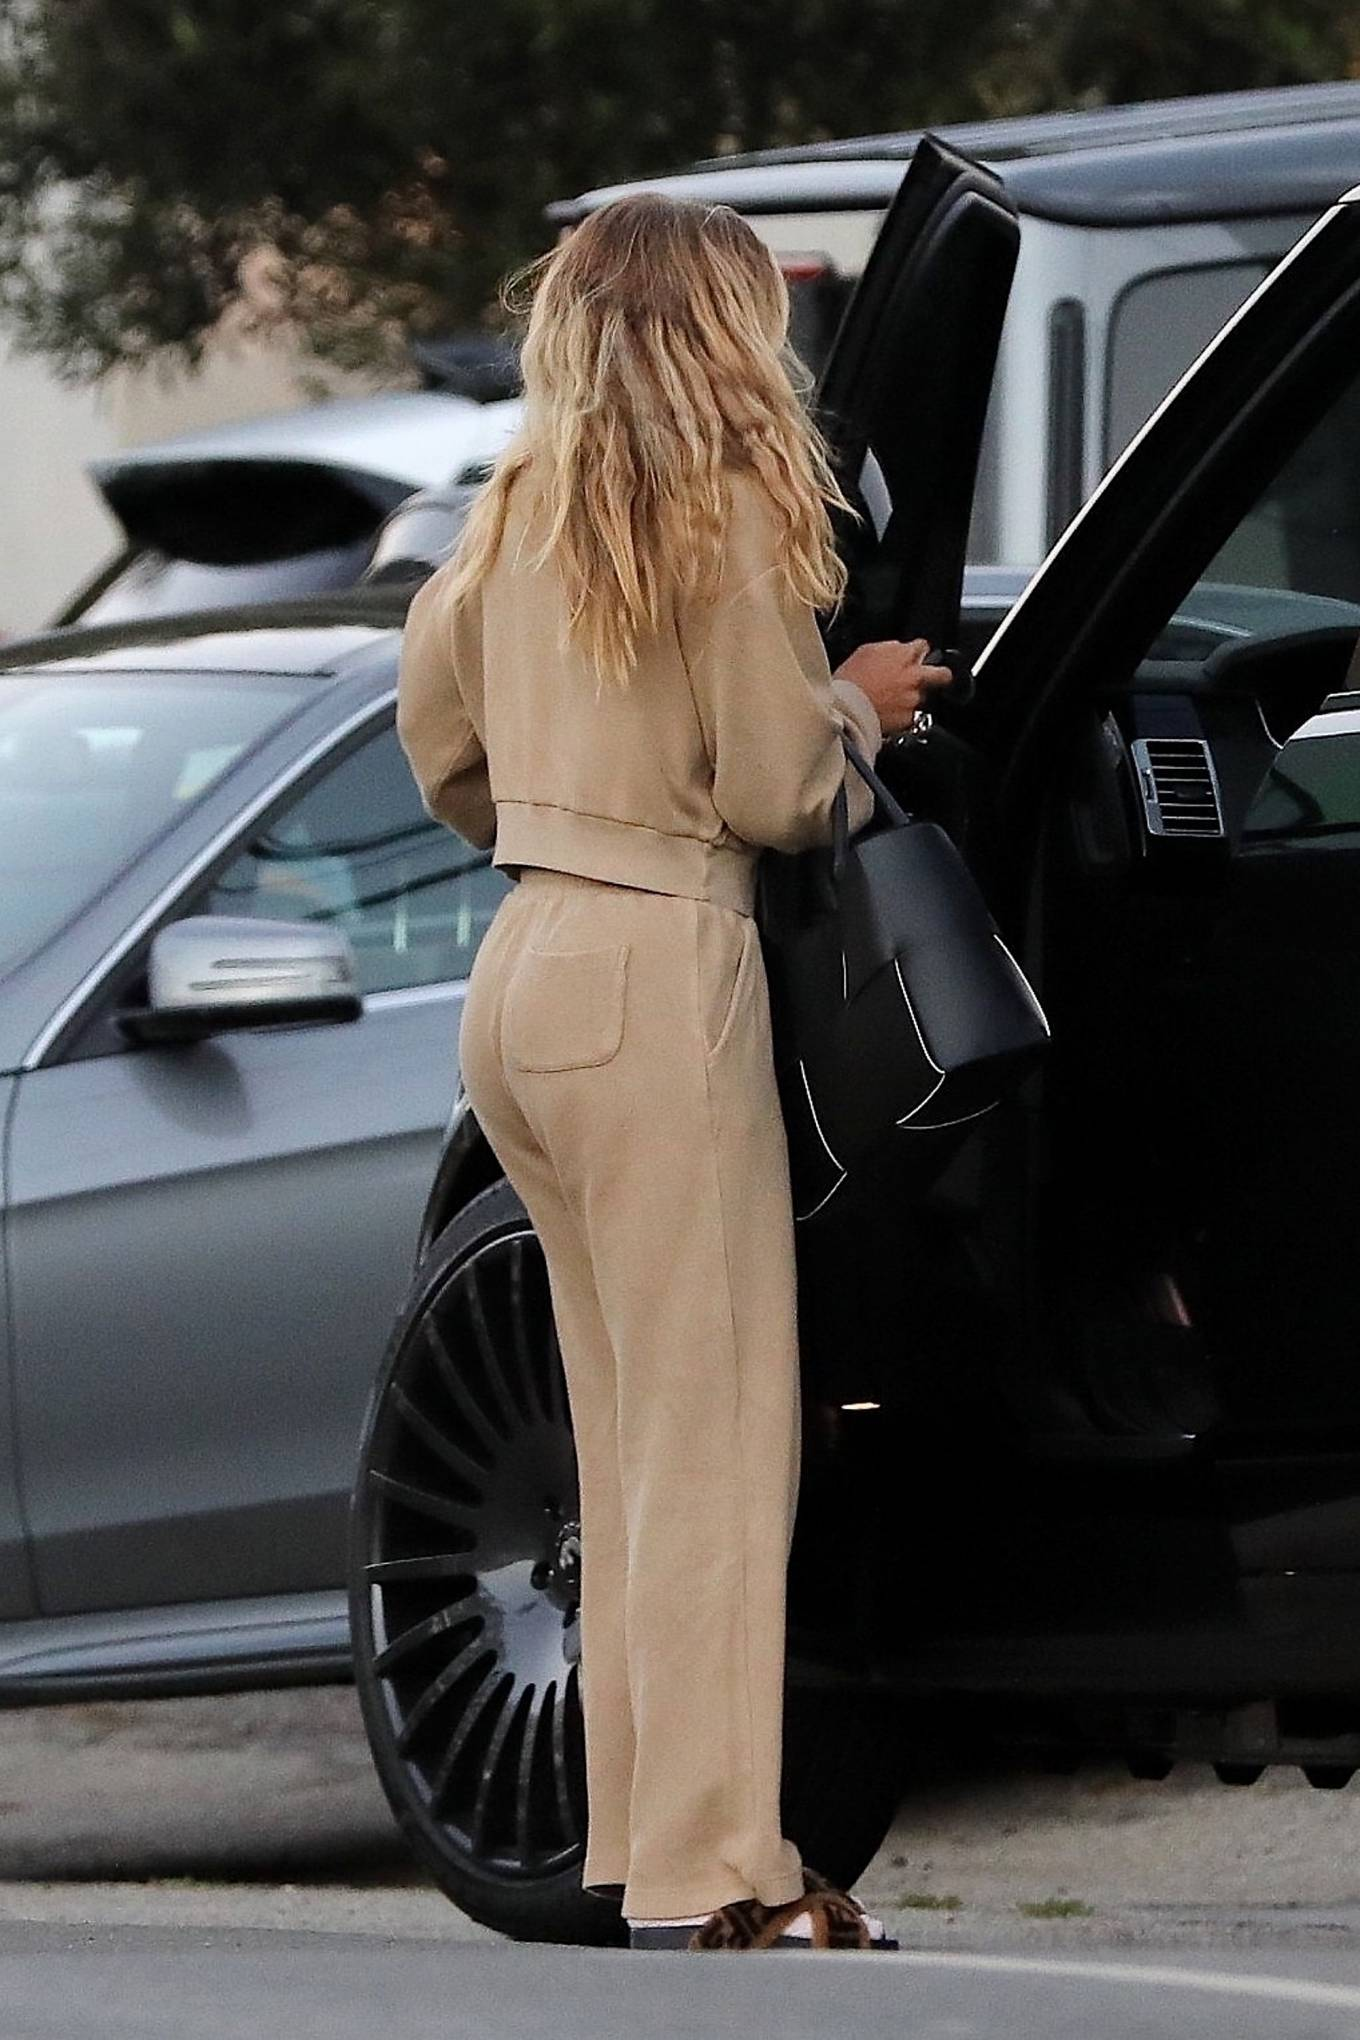 Sofia Richie - Looks stylish while leaving Malibu house